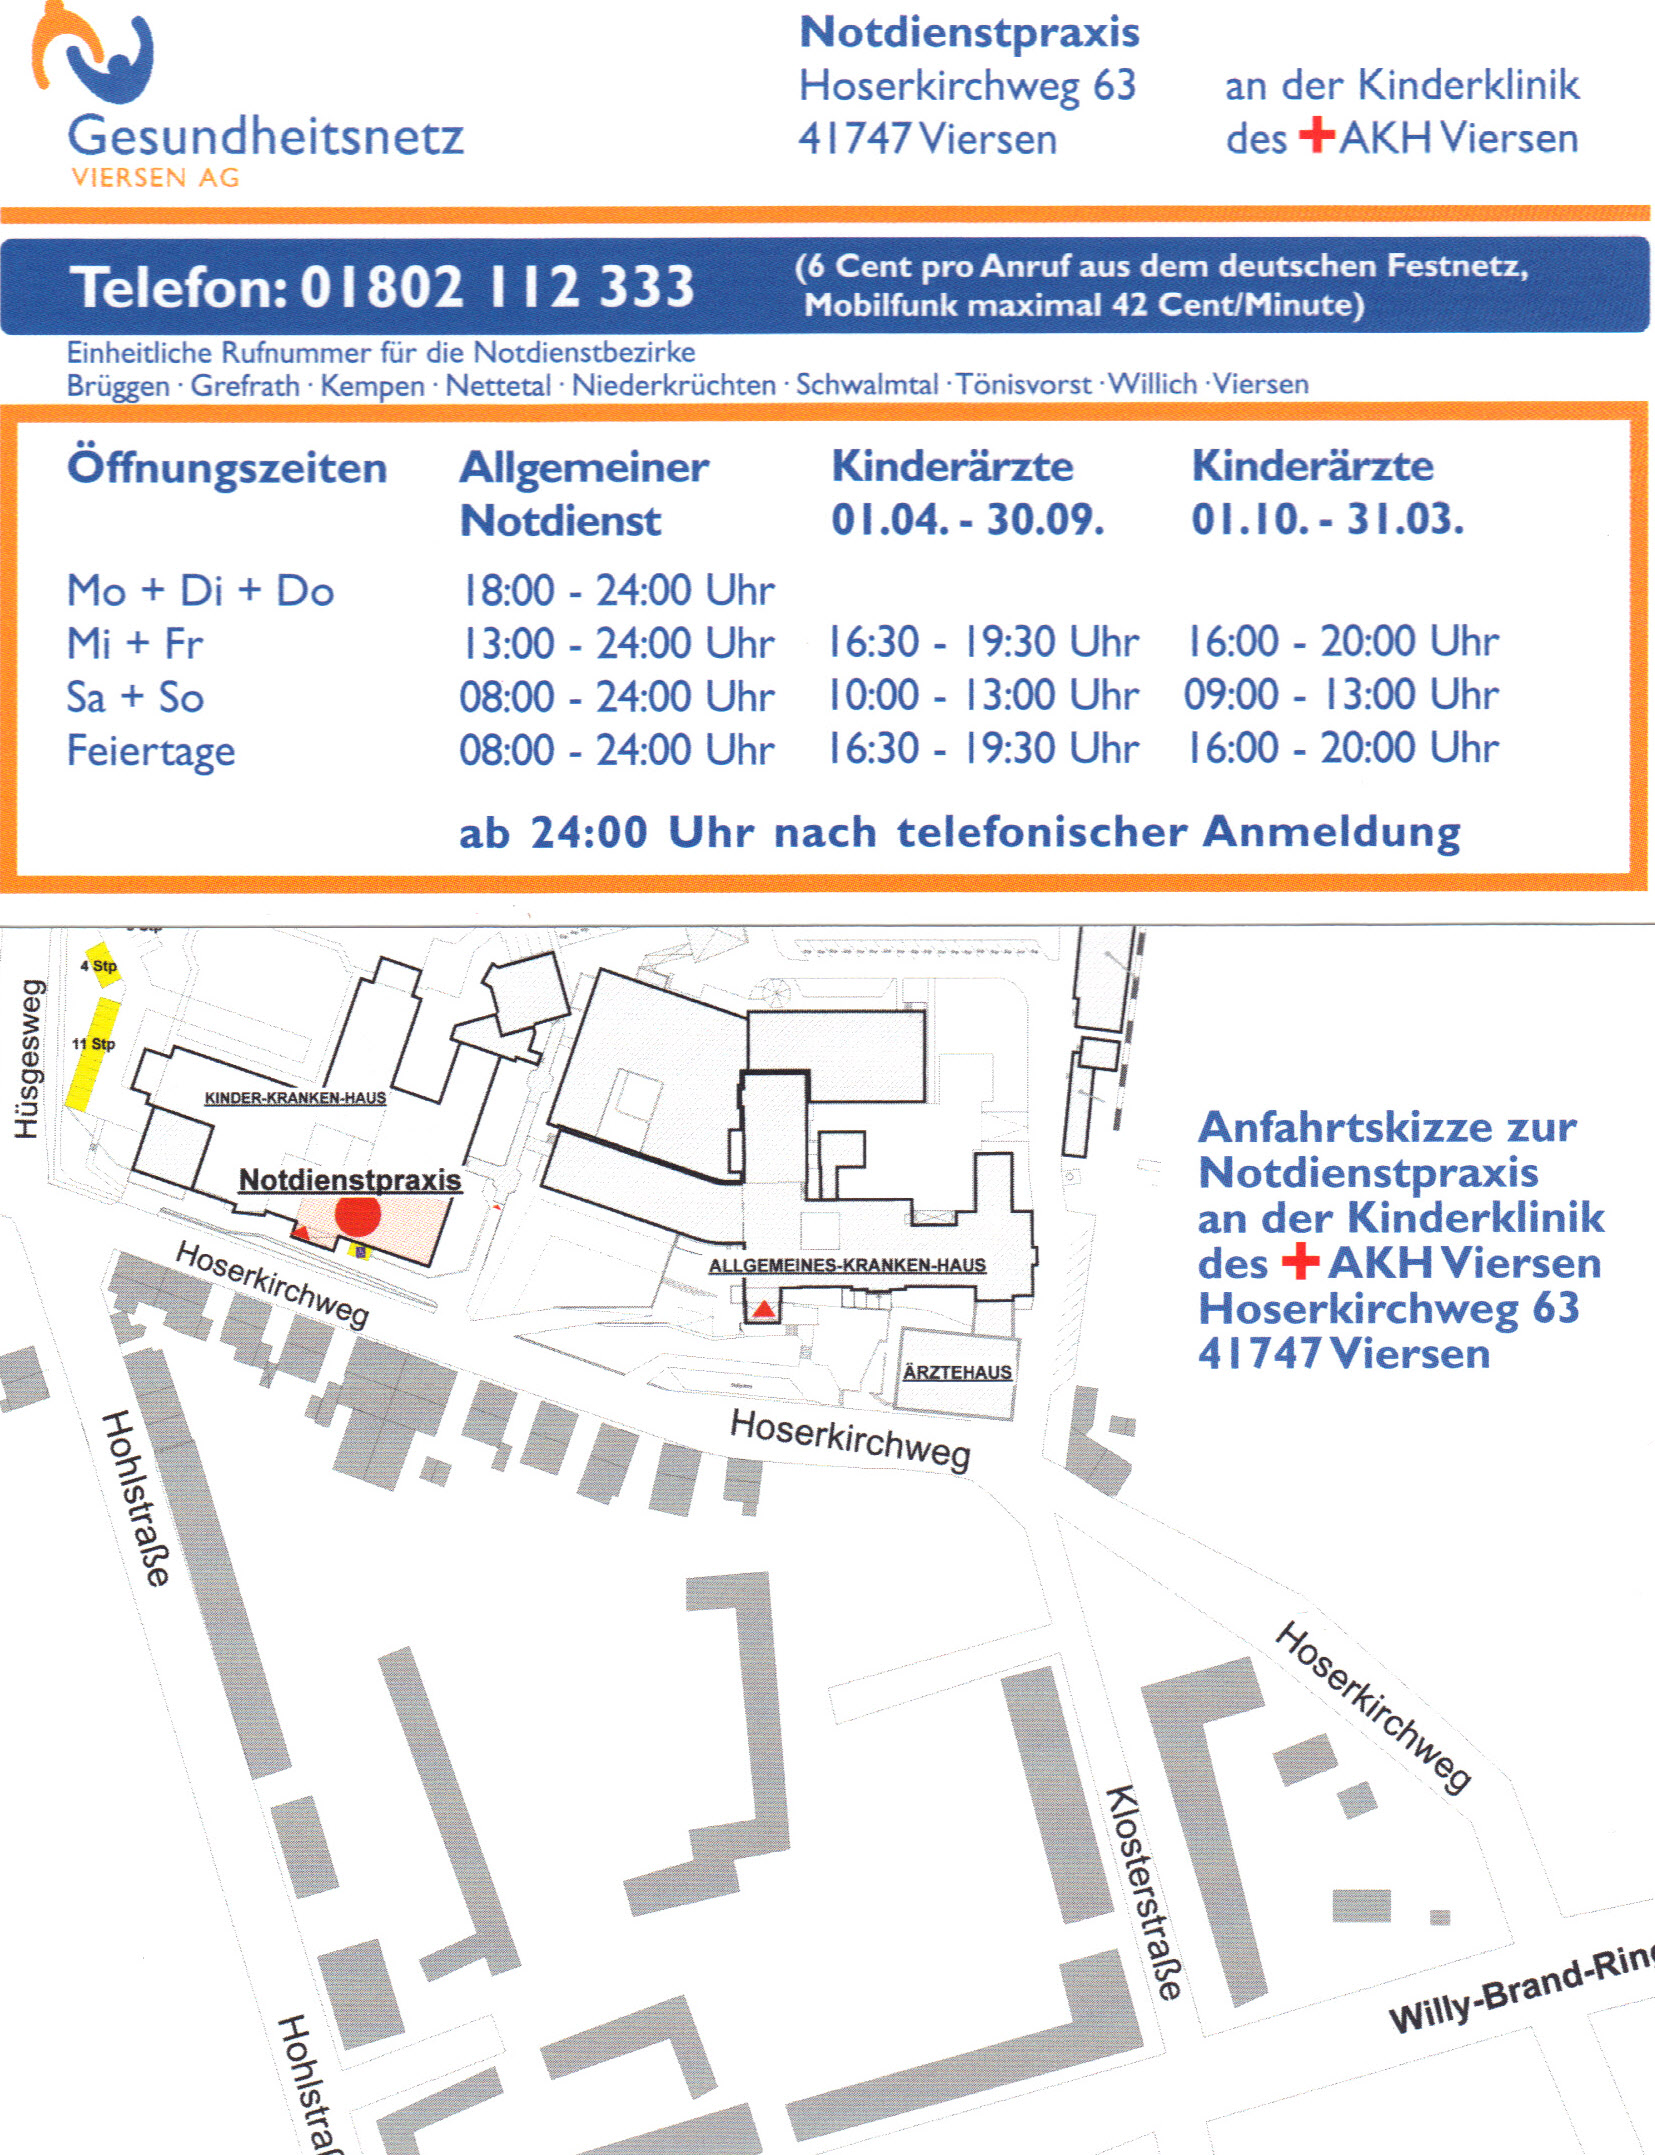 notfall praxis düsseldorf